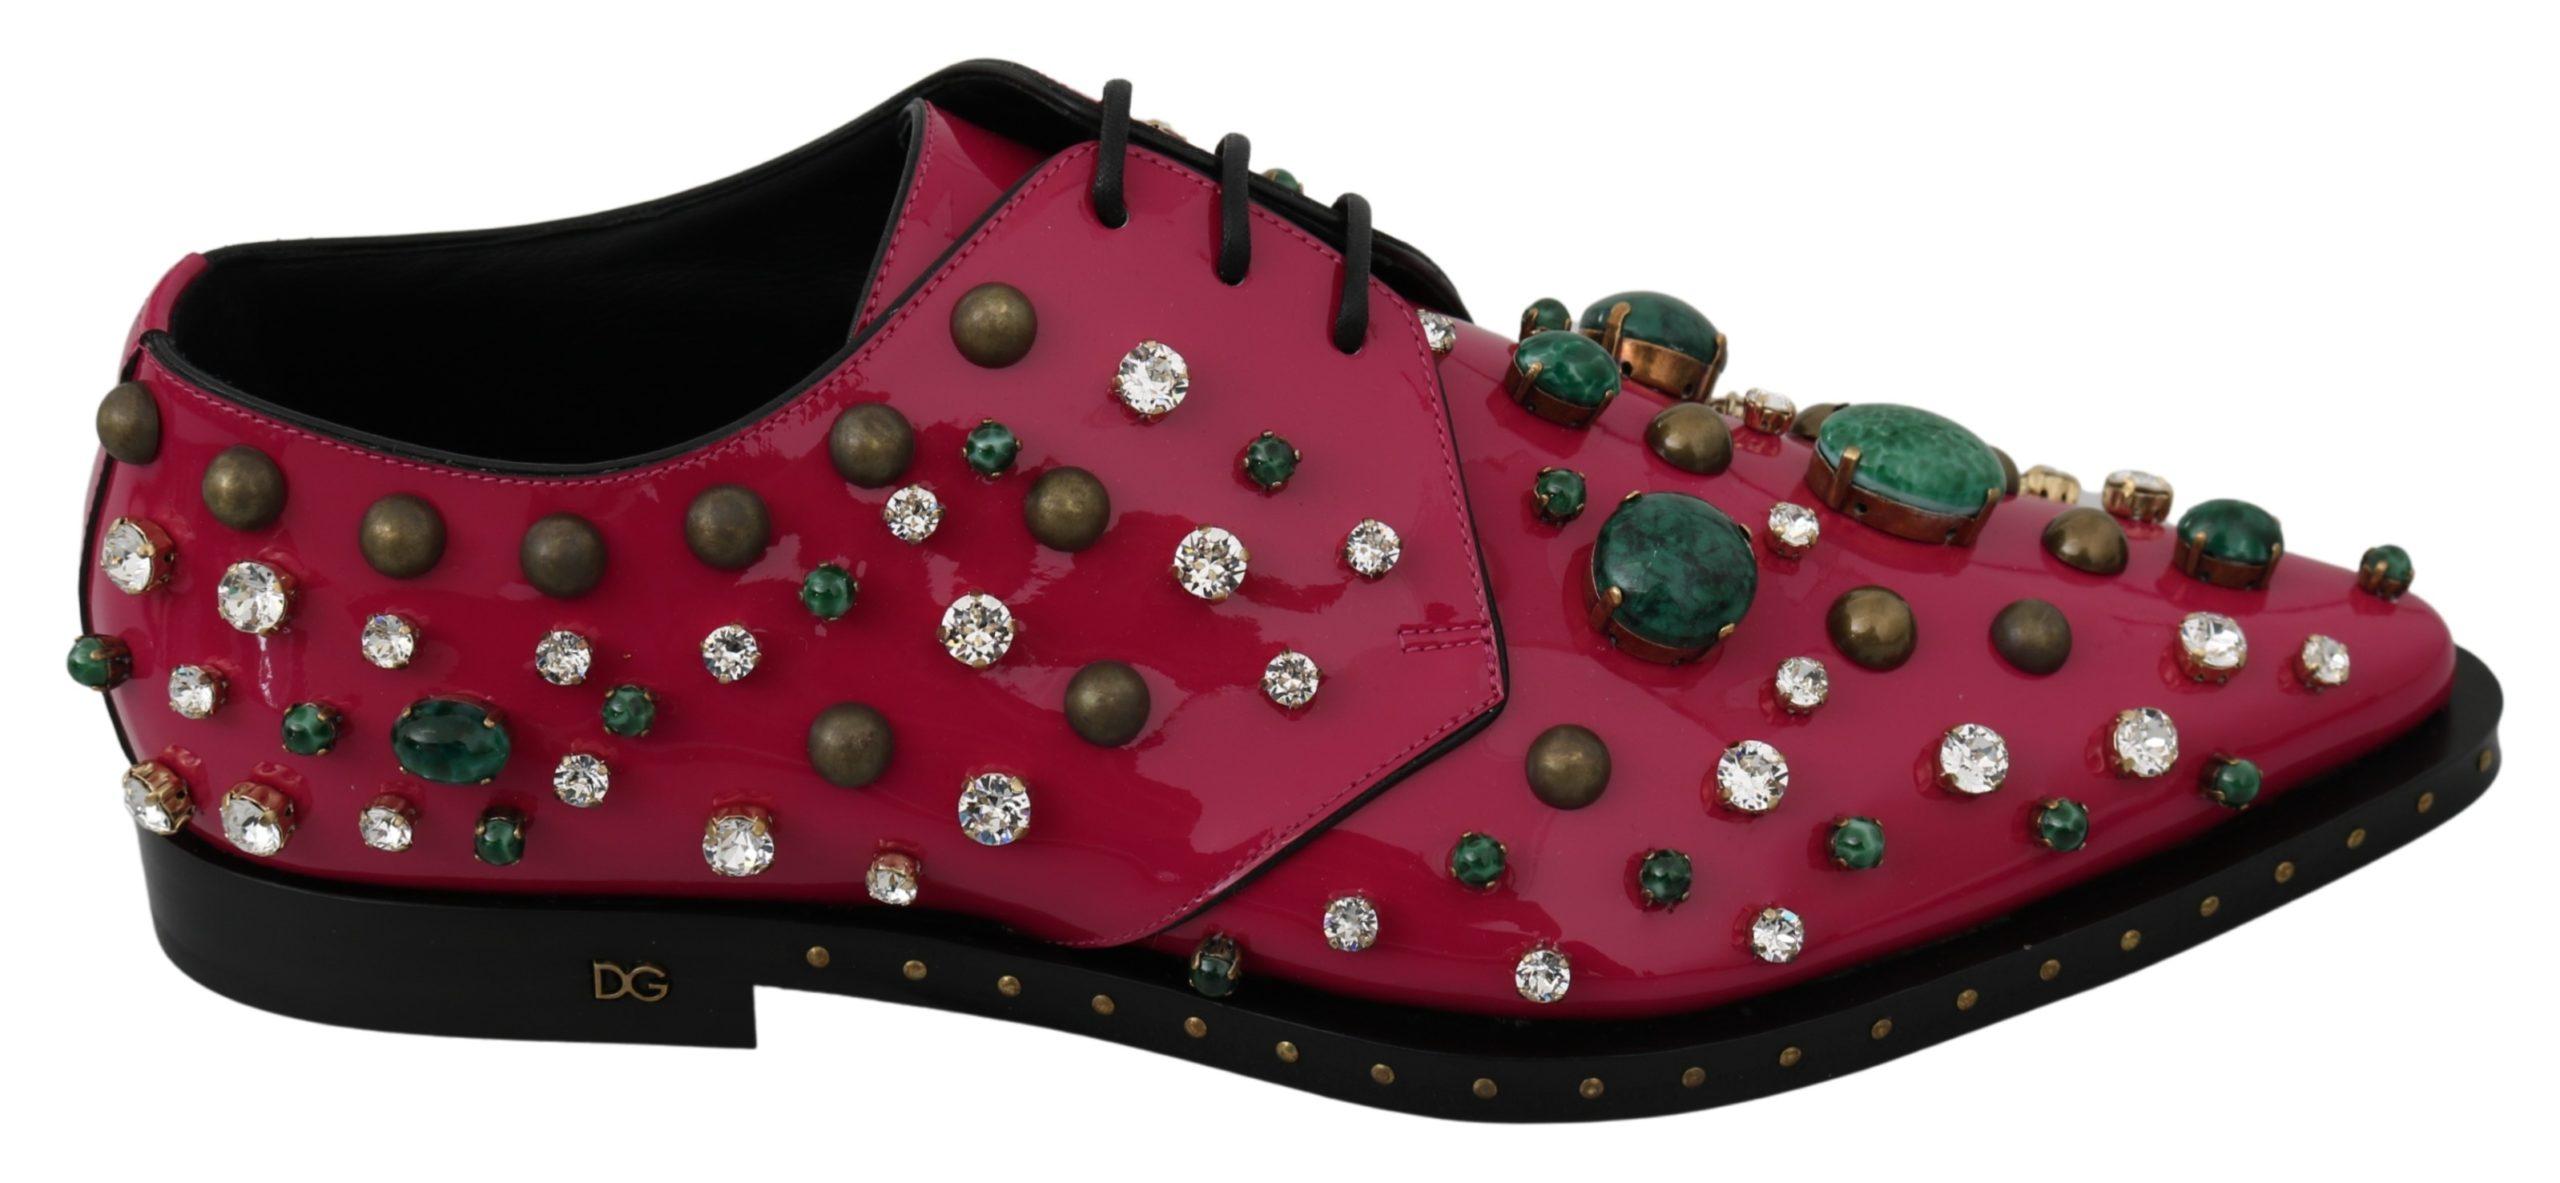 Dolce & Gabbana Women's Leather Crystals Dress Broque Shoe Pink LA7218 - EU41/US10.5